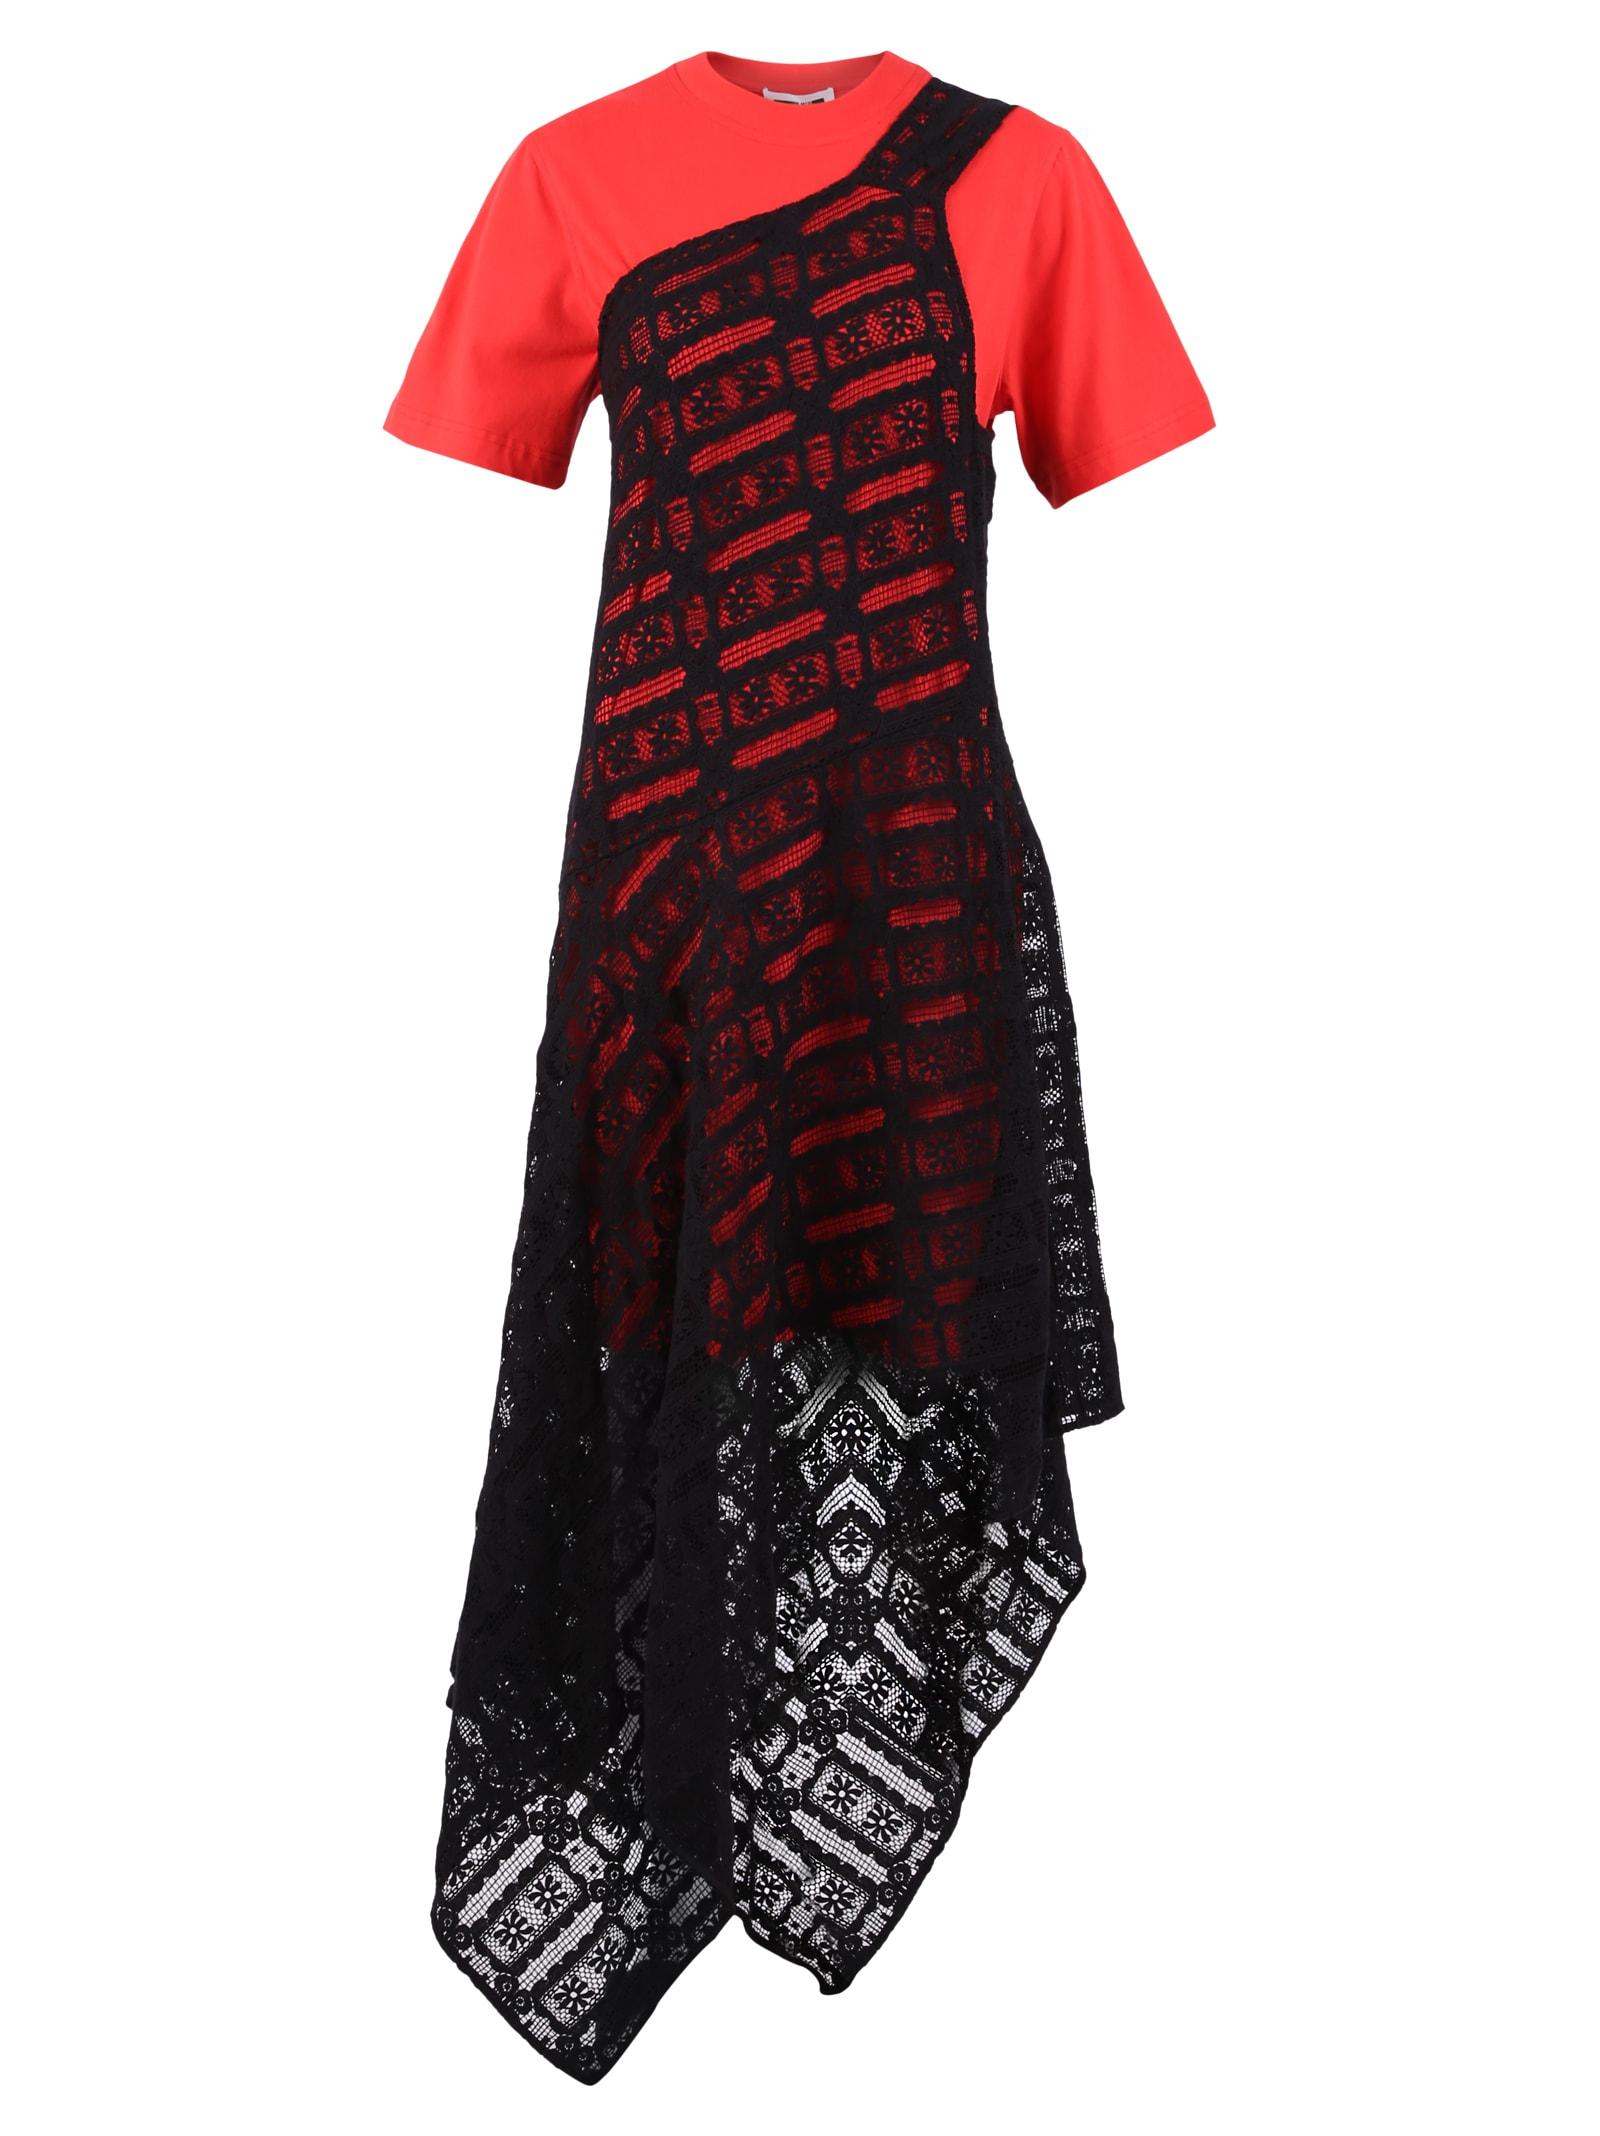 Buy McQ Alexander McQueen Layered Dress online, shop McQ Alexander McQueen with free shipping